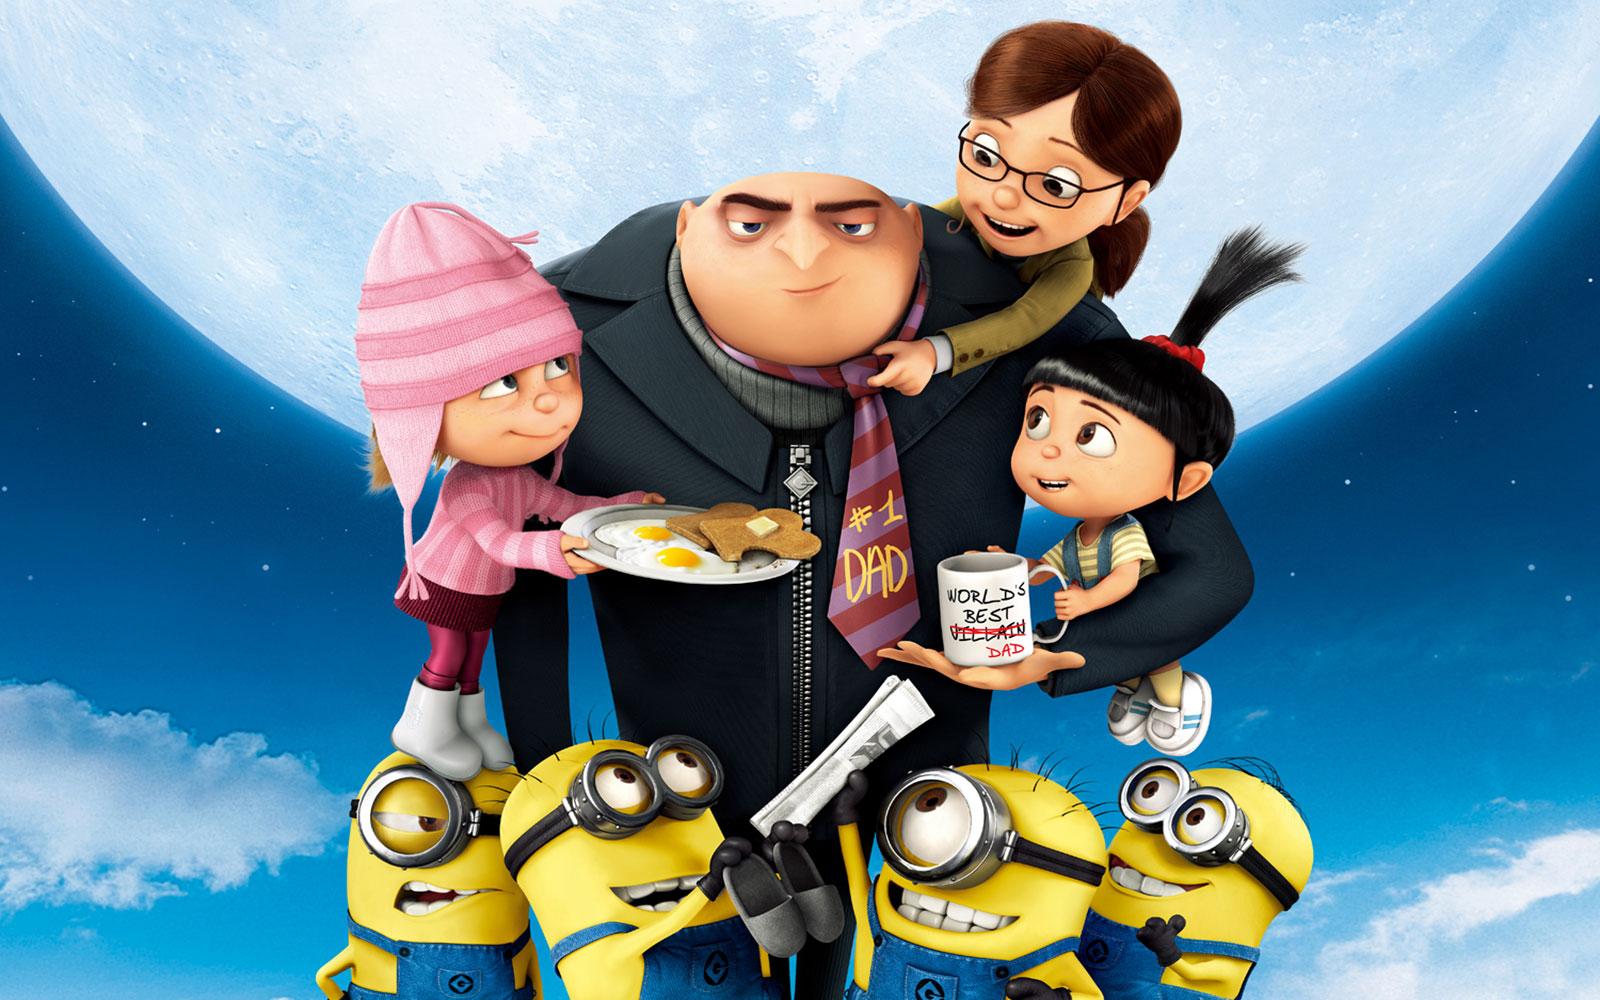 15 Film Animasi Terbaik Sepanjang Masa - Zakipedia